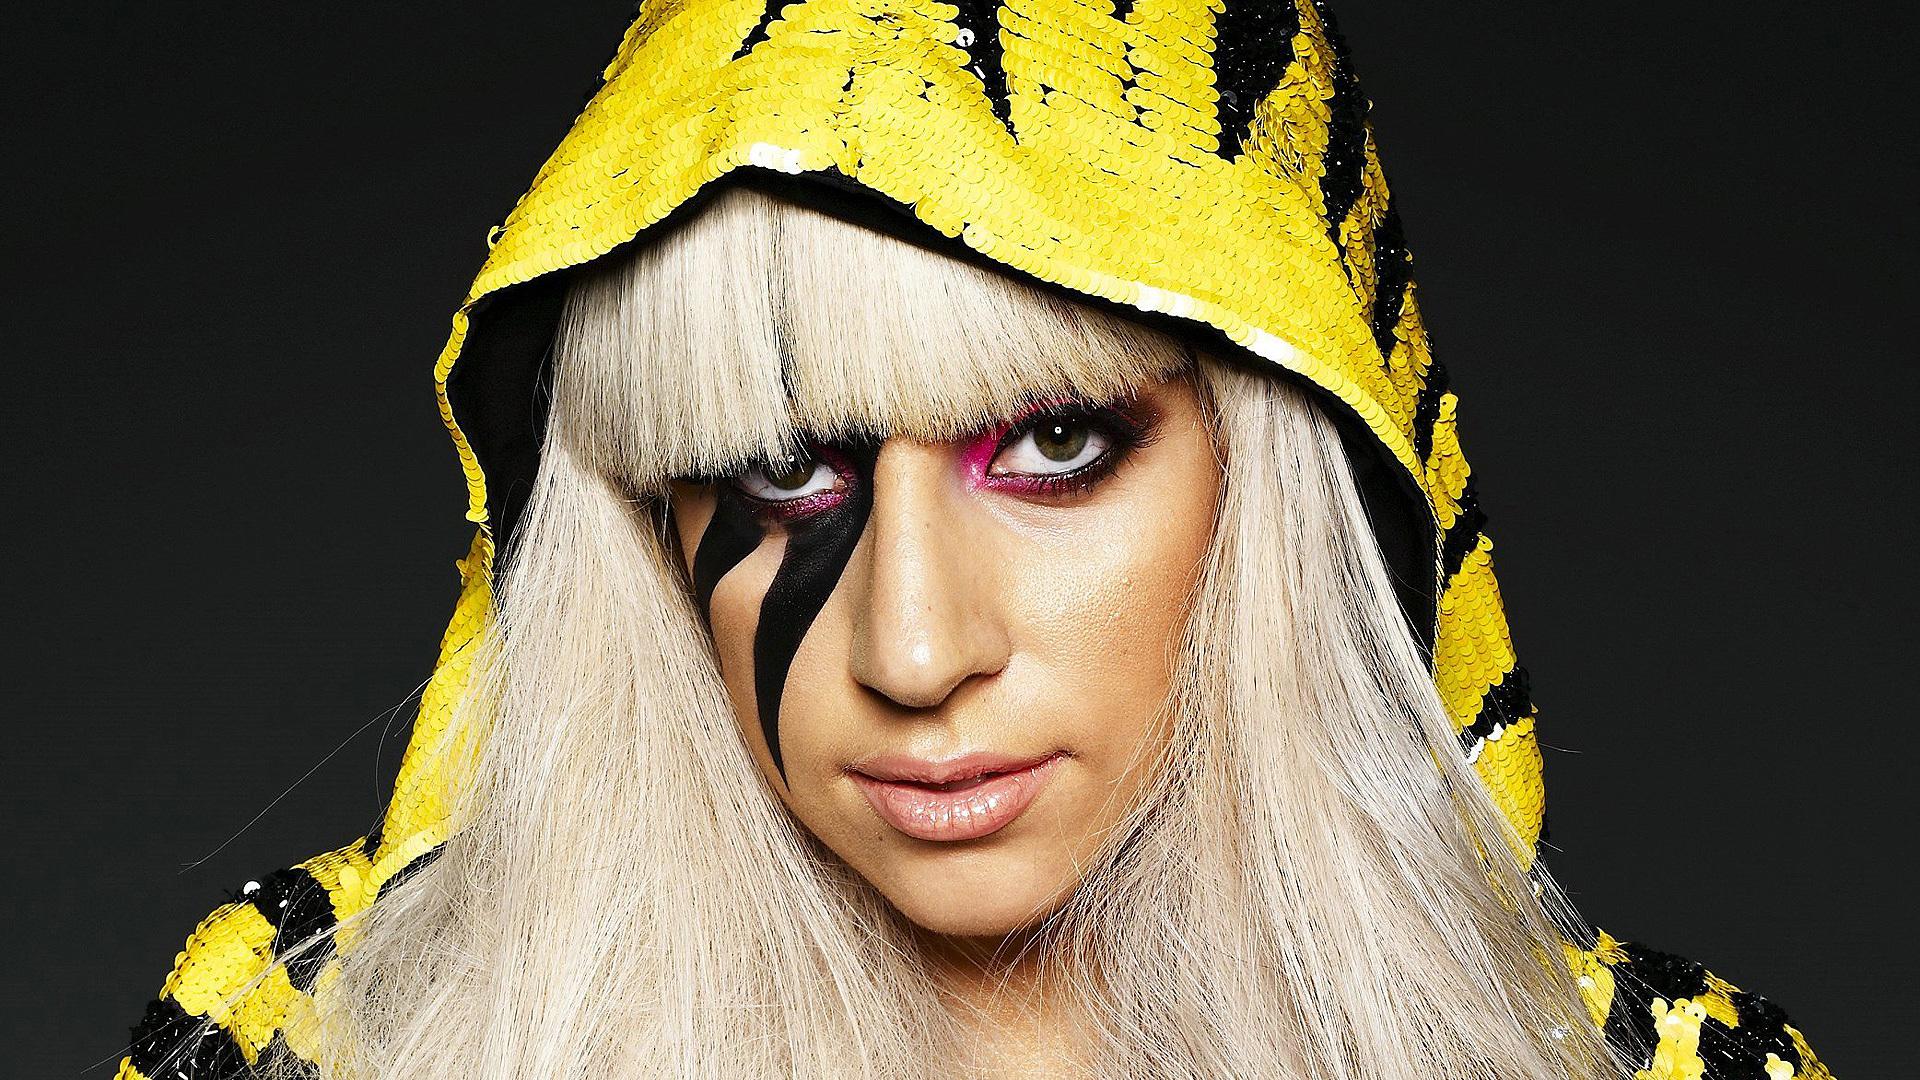 Lady Gaga Background